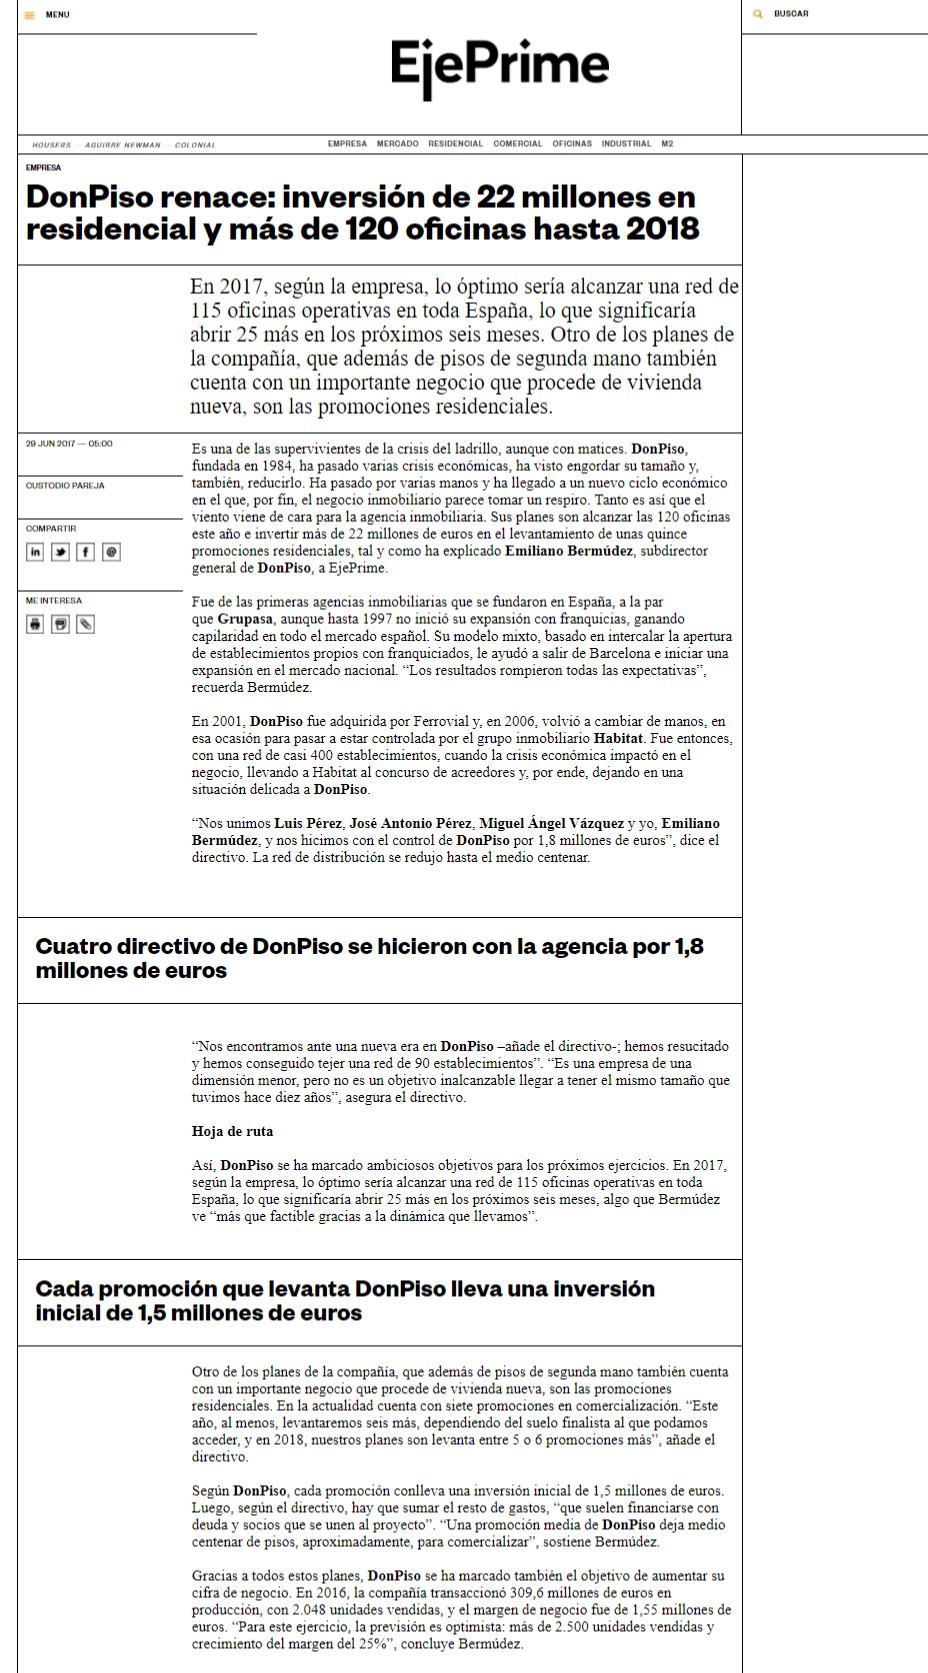 https://whiterabbit.es/wp-content/uploads/2017/06/Eje-Prime.png